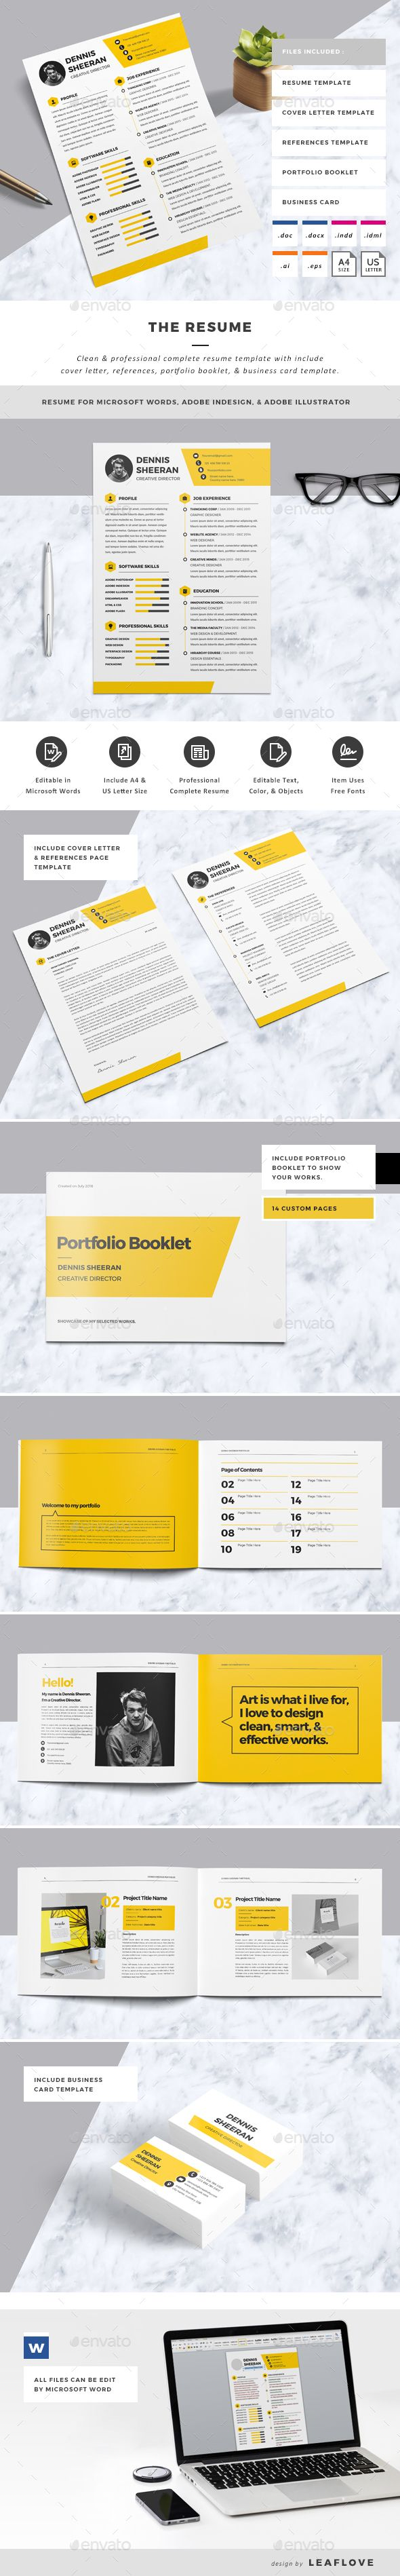 1552 best Resume Design images on Pinterest | Resume, Cv resume ...